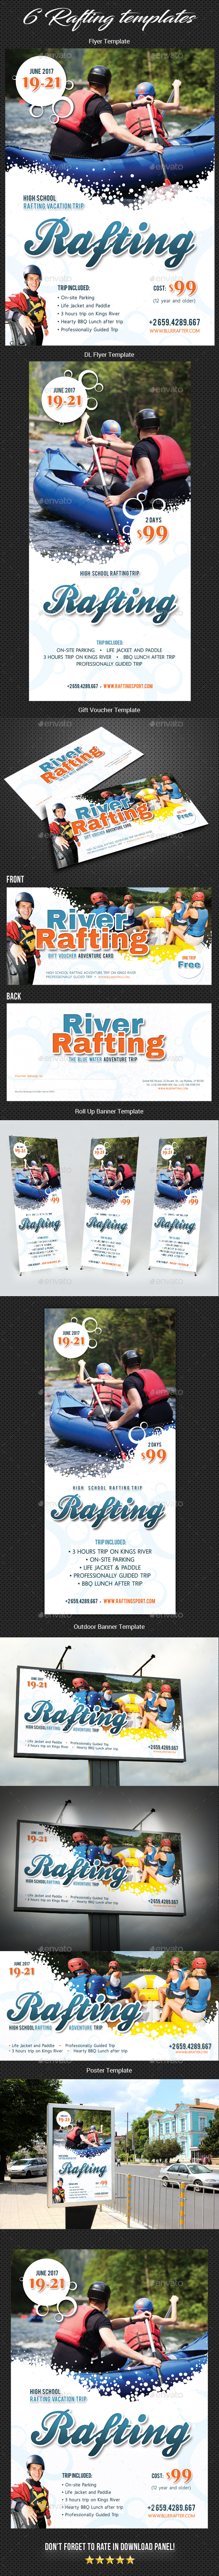 Rafting Flyer Poster Banner Bundle 2 - Signage Print Templates